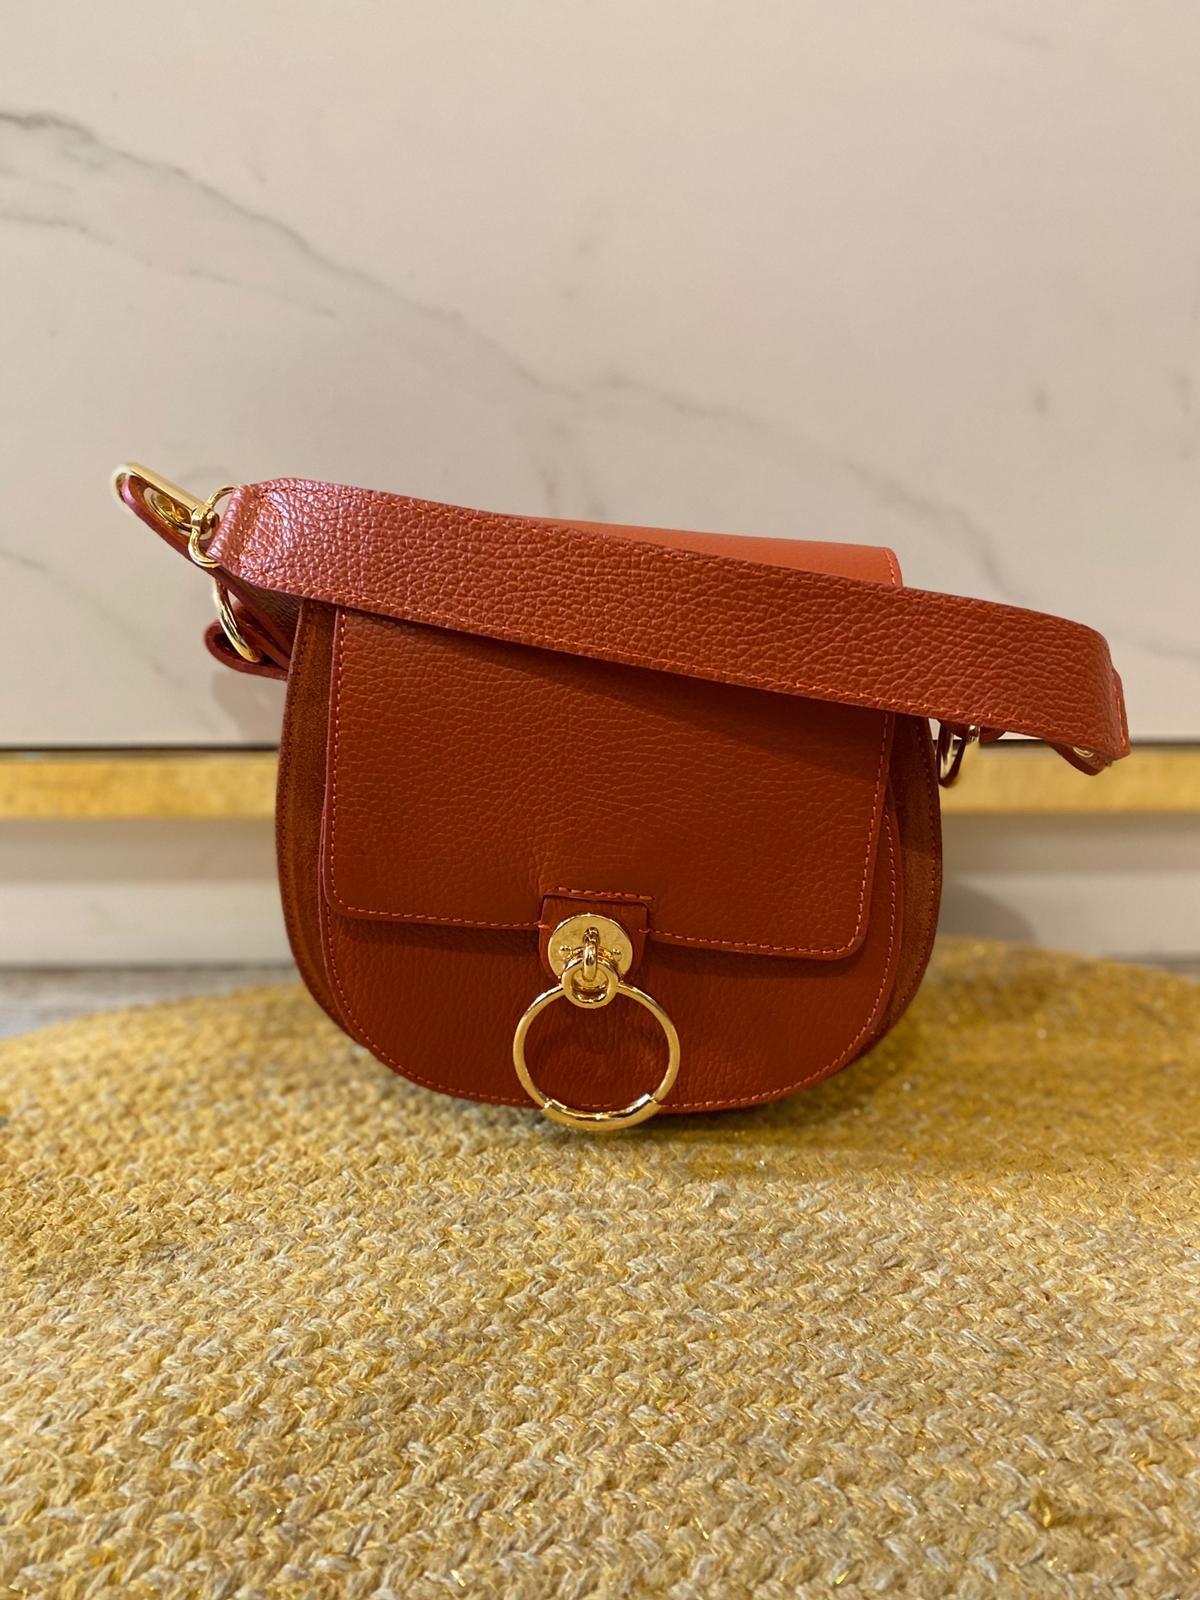 2014 My Fashion Bag Karmijn